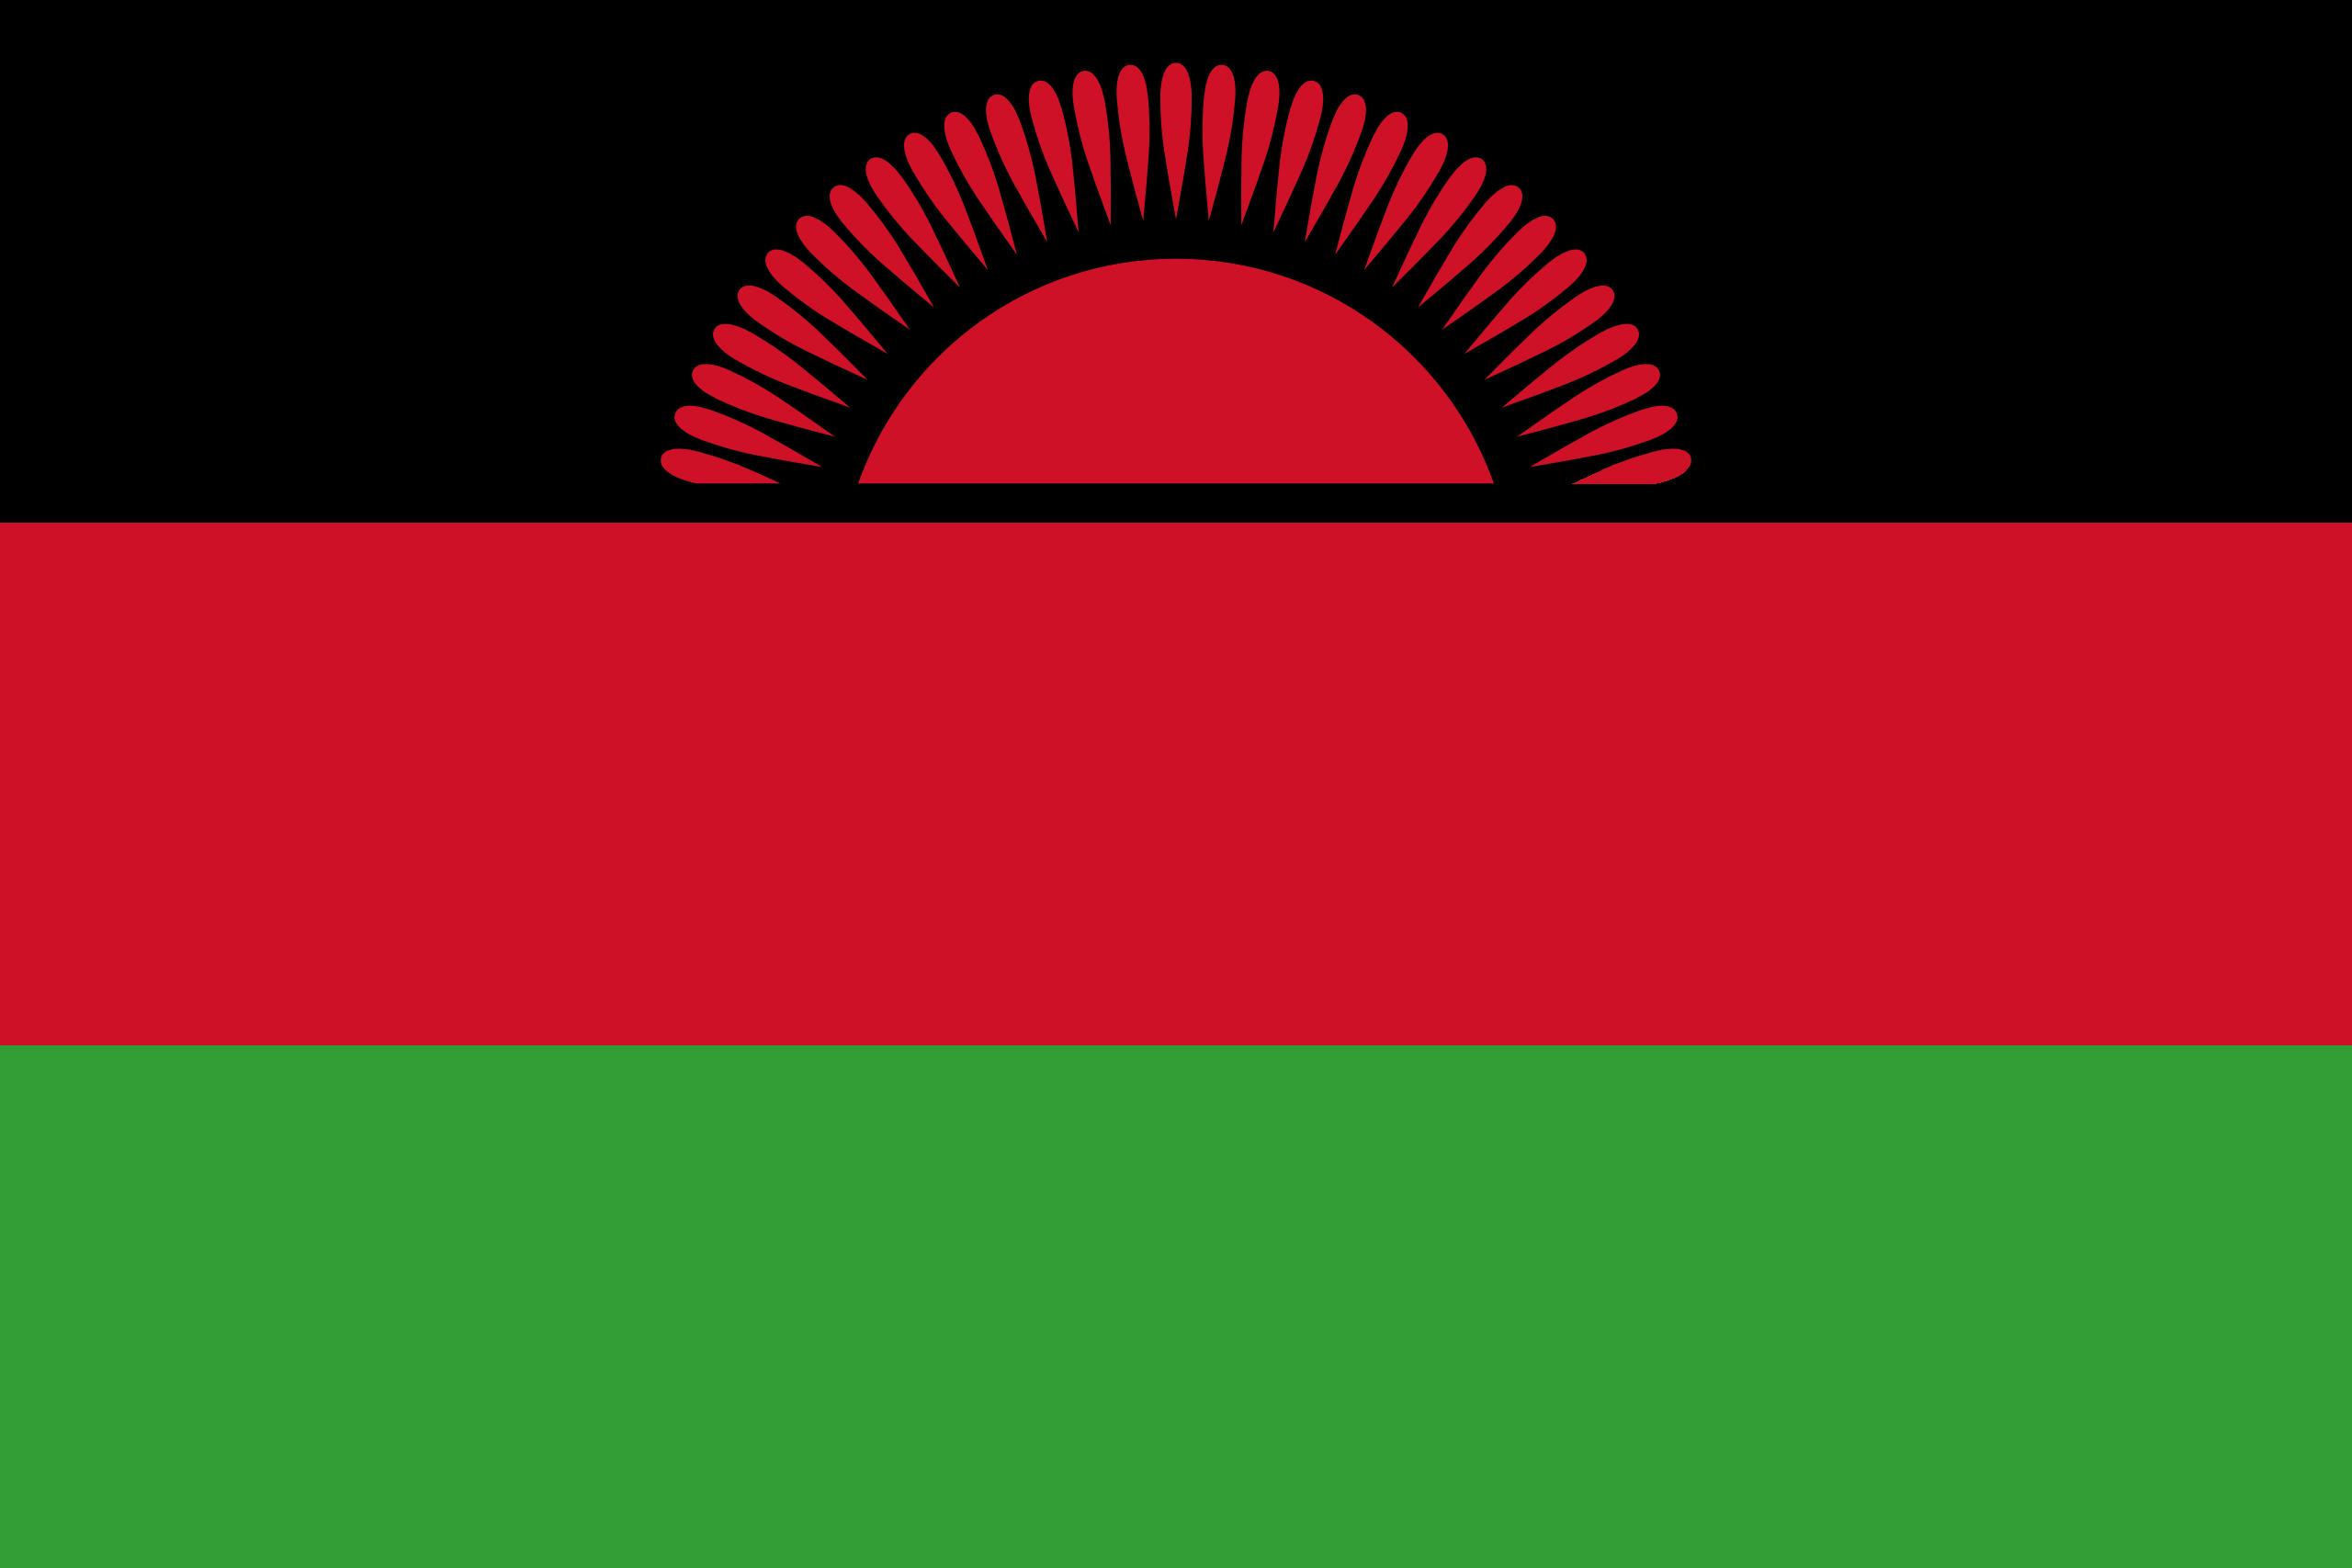 malawi, país, emblema, insignia, σύμβολο - Wallpapers HD - Professor-falken.com